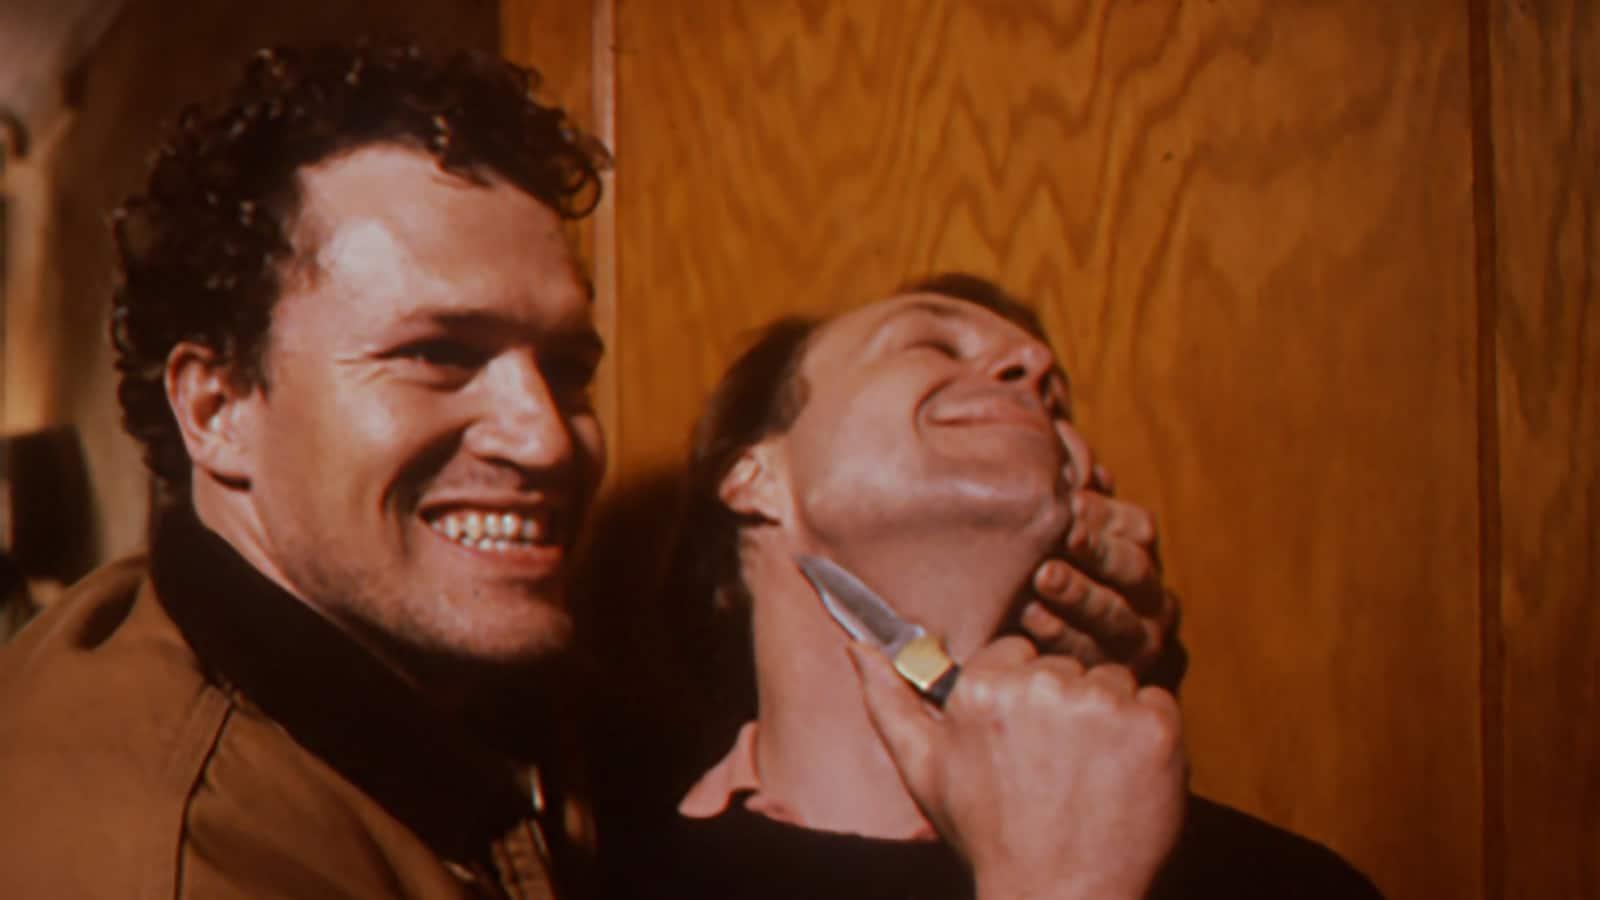 henry-portrait-of-a-serial-killer-1986